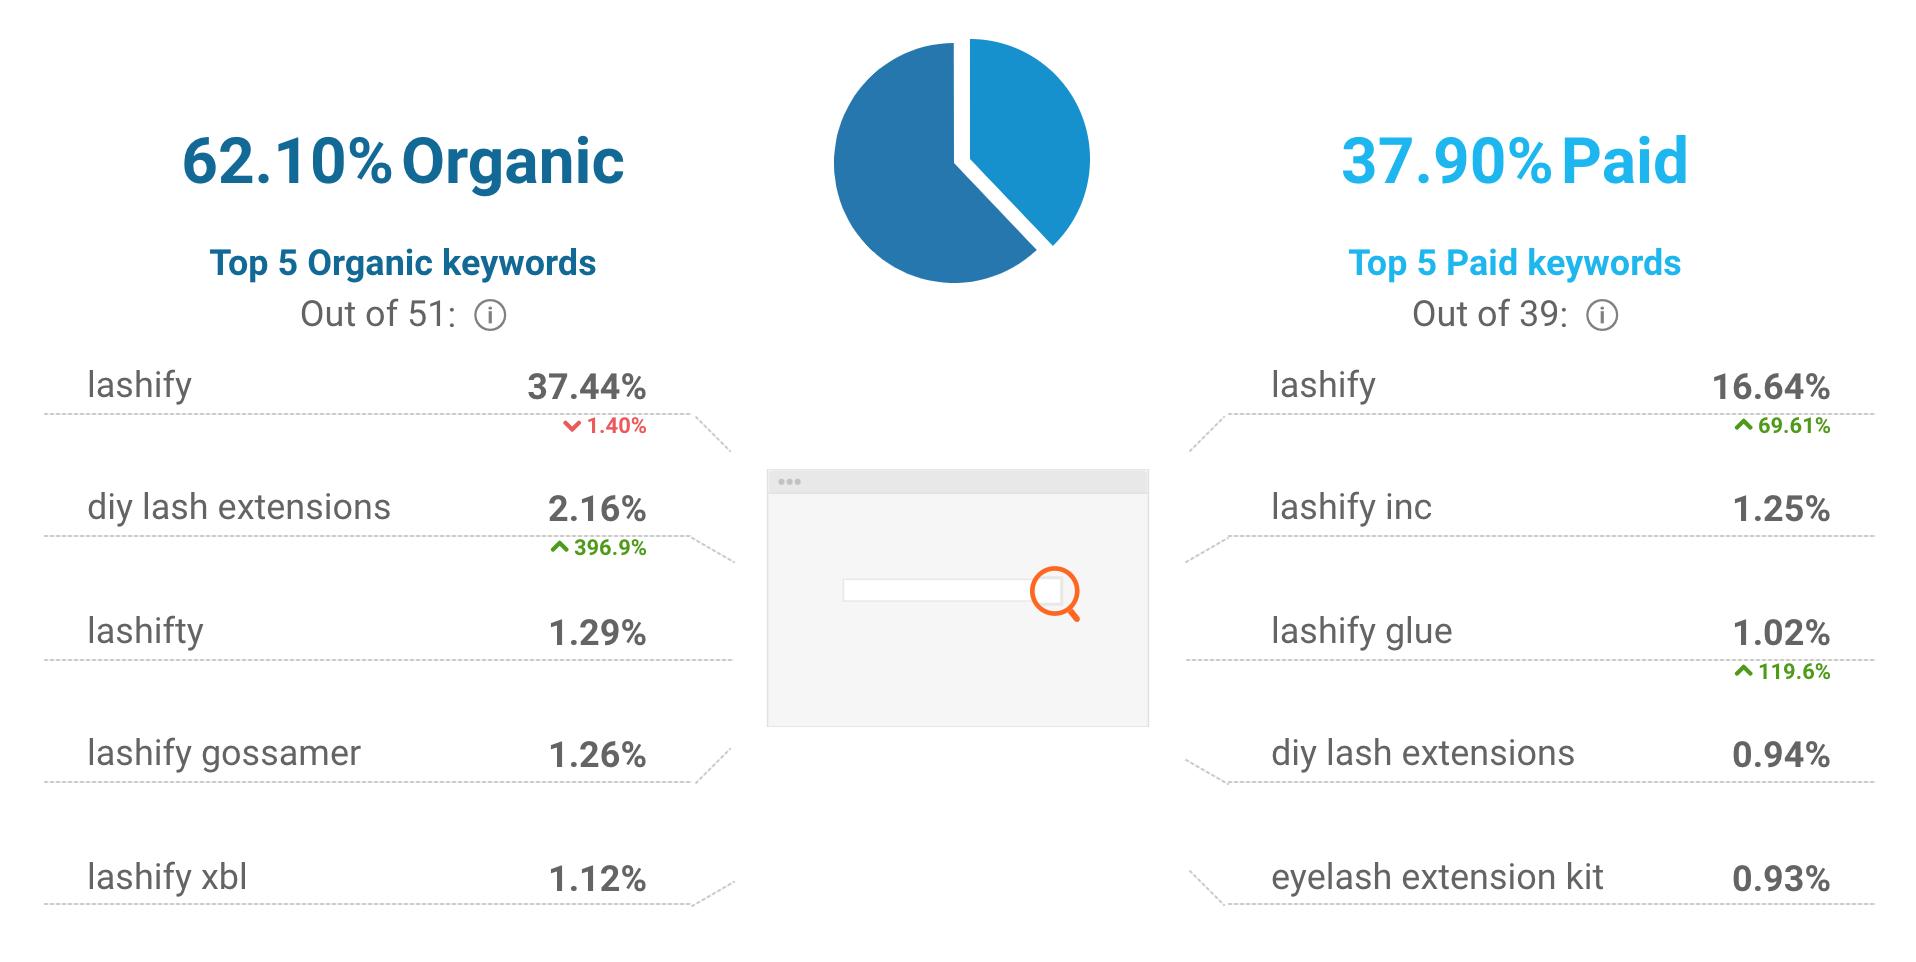 Lashify's website traffic sources